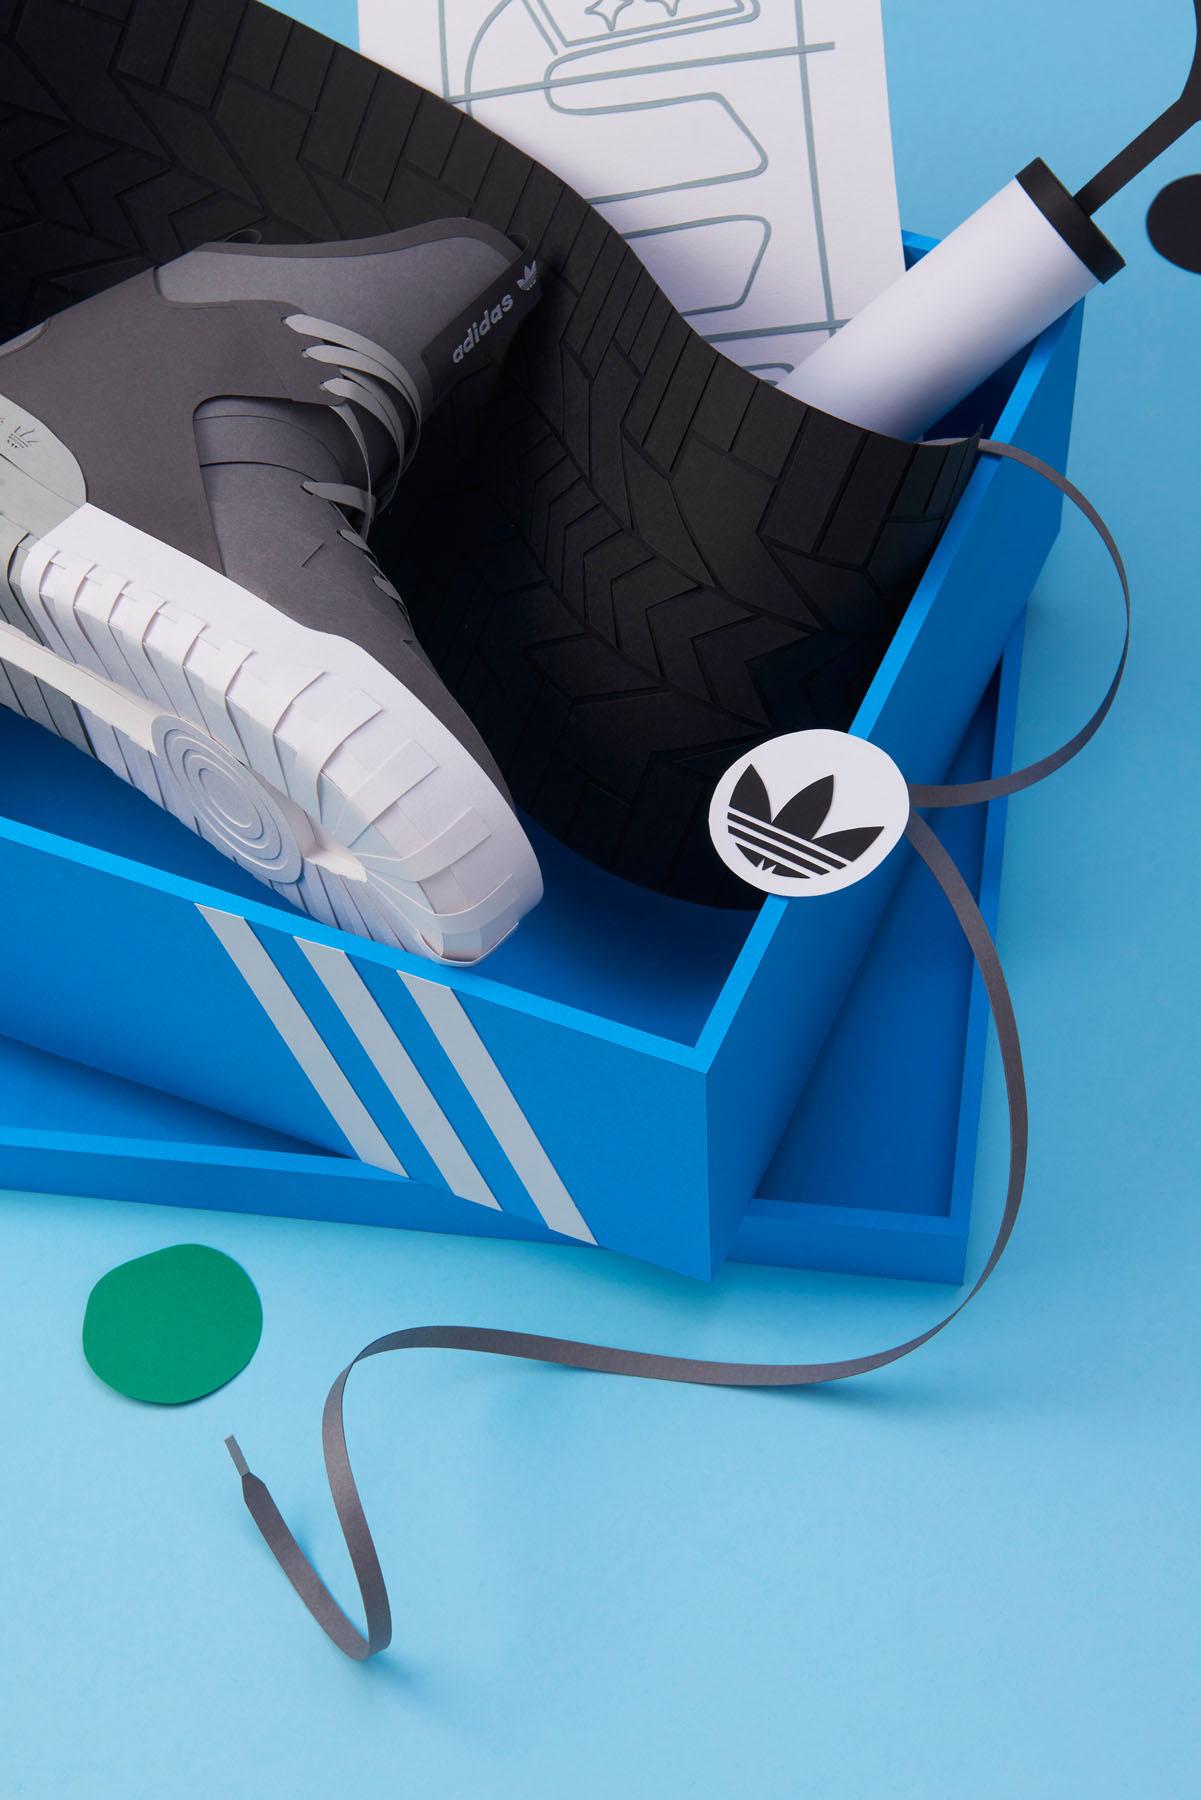 Paper sculpture of Adidas tennis shoe.